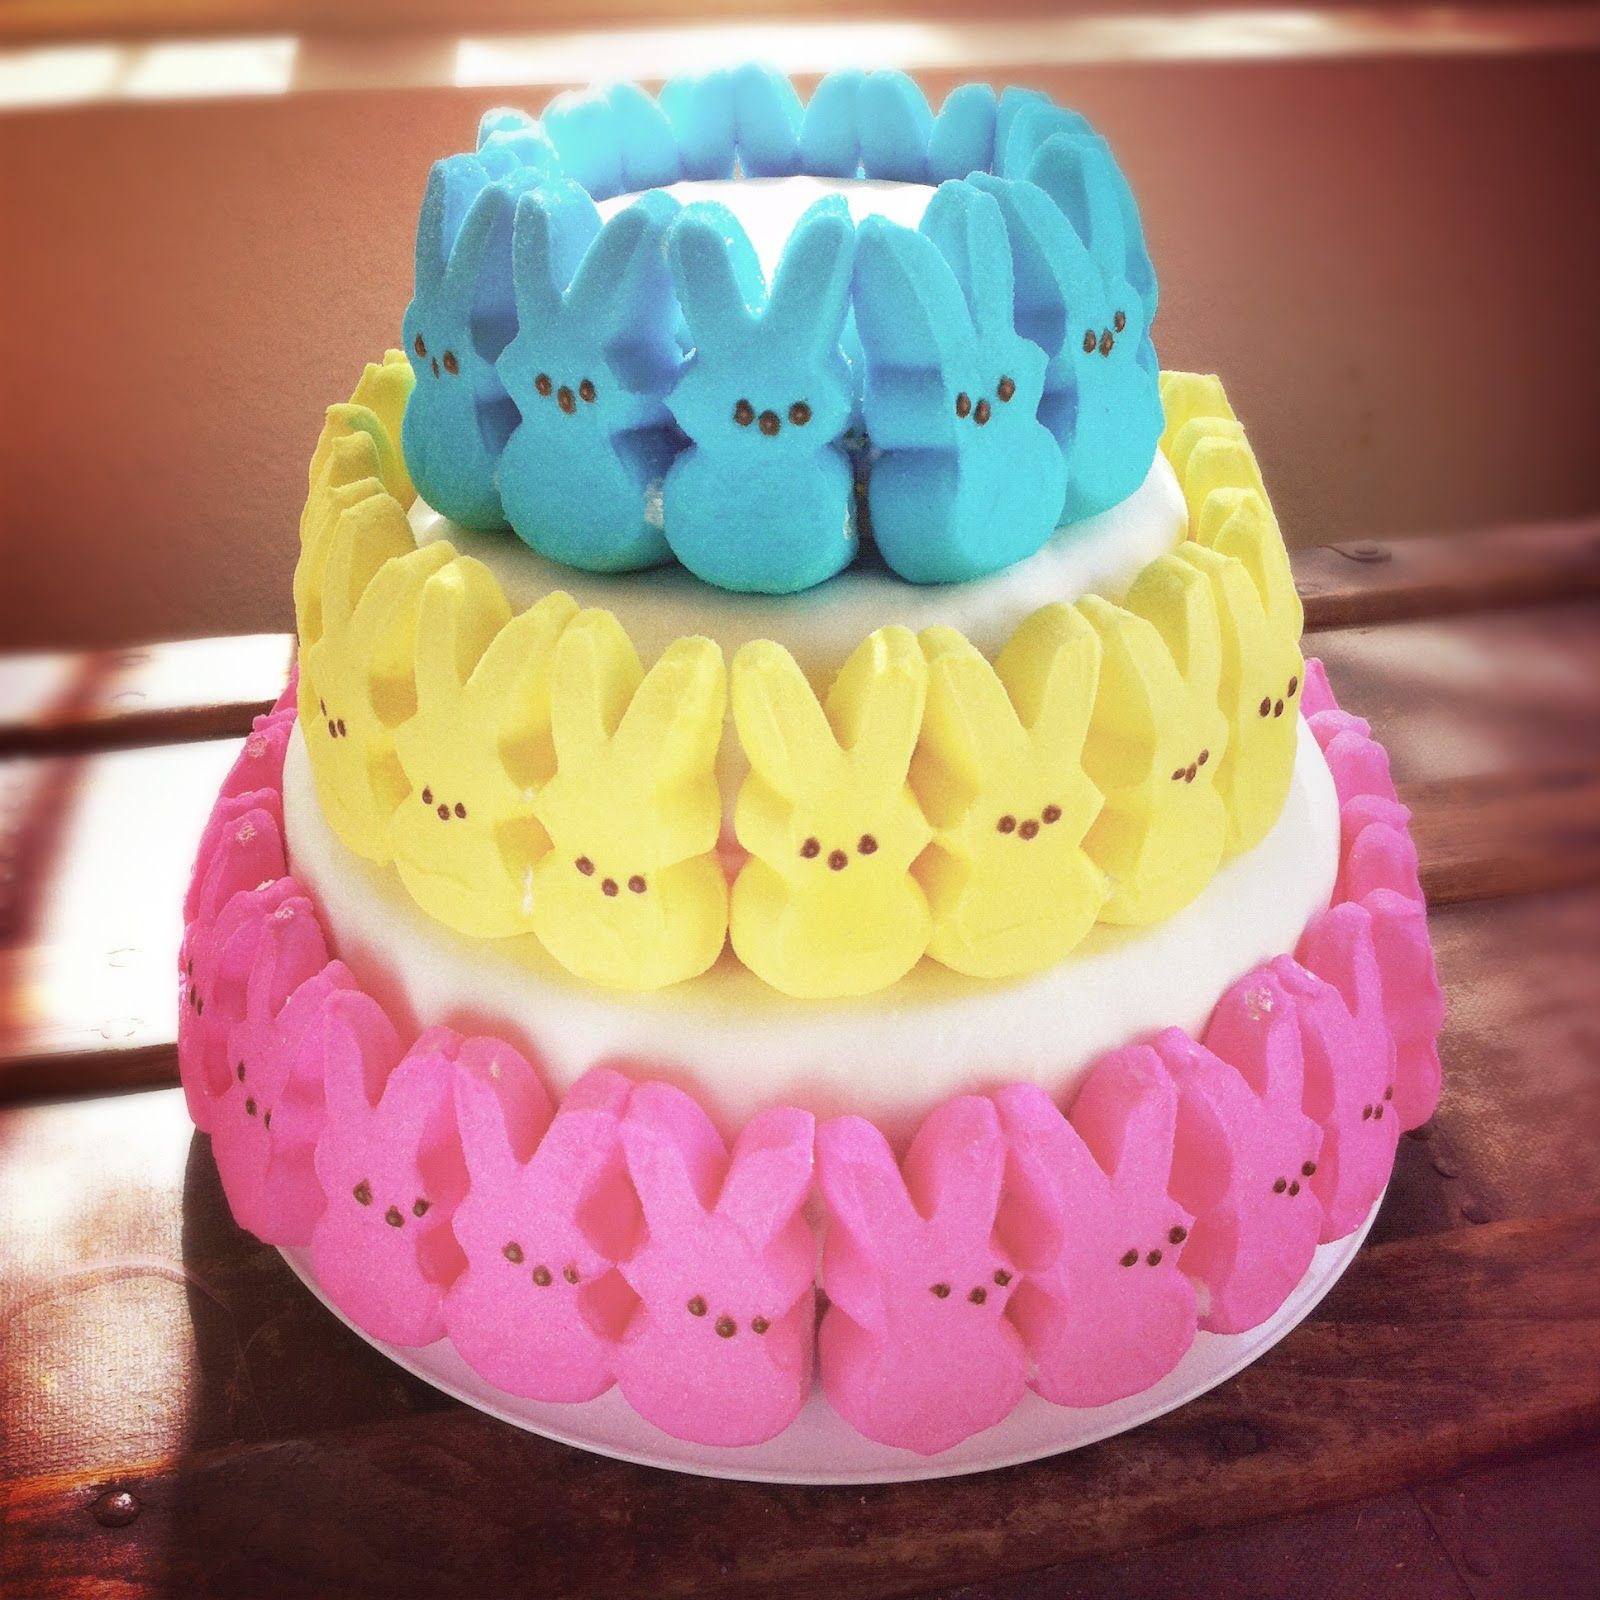 Bunny Peep Cake   Hoppy Easter!   Pinterest   Peeps, Bunny and Cake